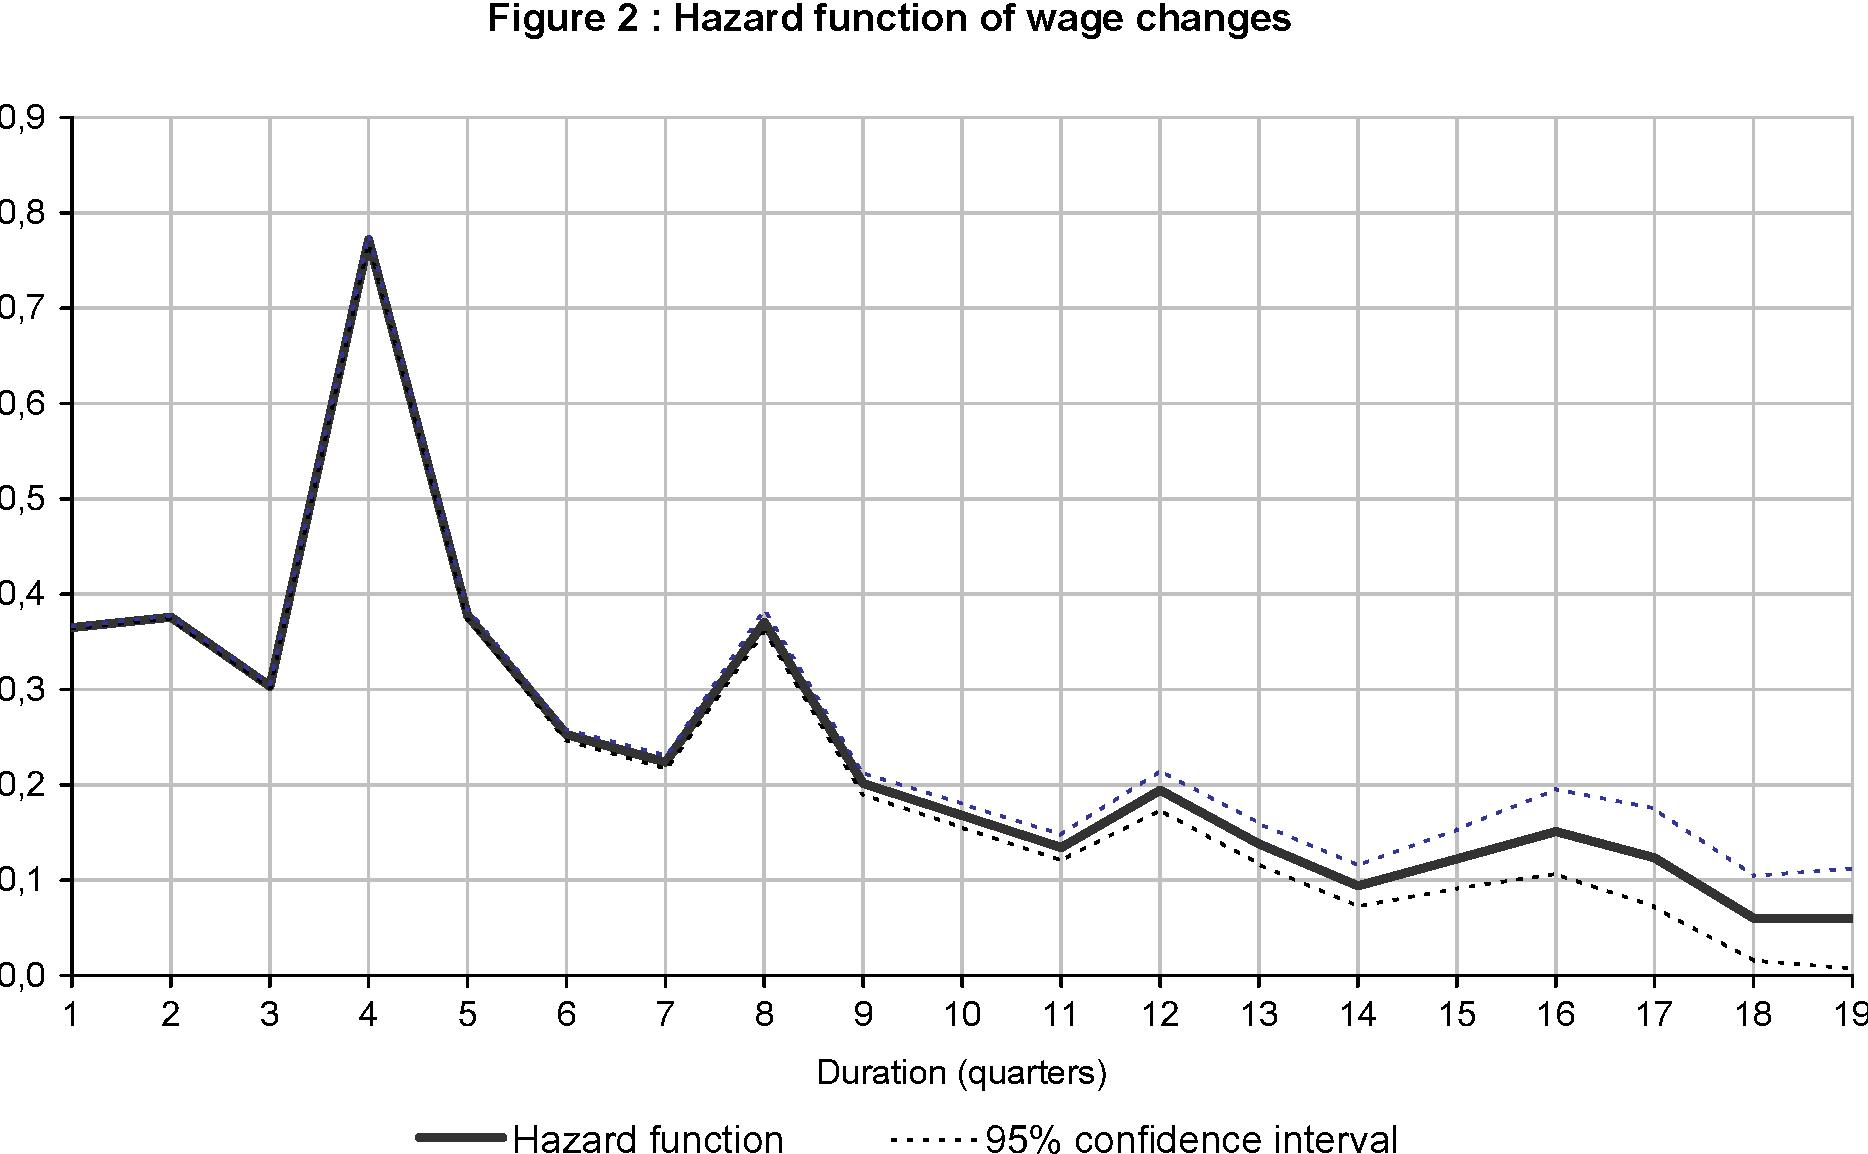 Figure 2 : Hazard function of wage changes